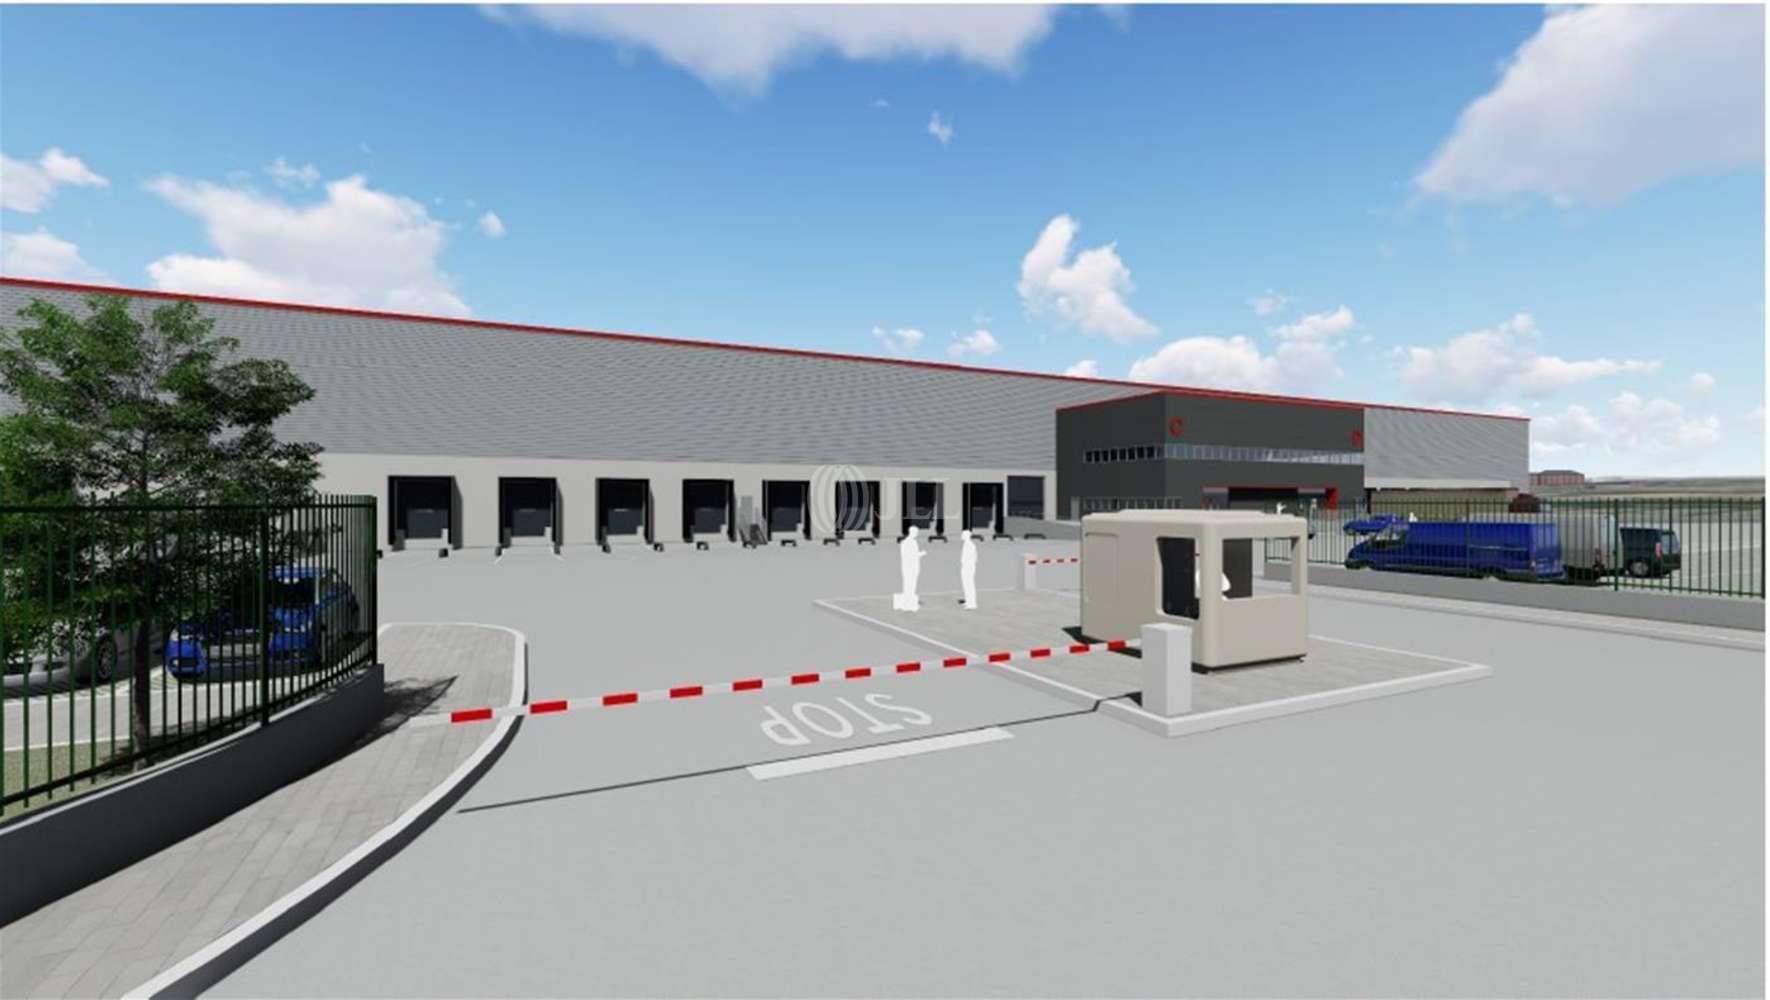 Naves industriales y logísticas Santa perpètua de mogoda, 08130 - Nave Logistica - B0488 PI LA LLAGOSTA - 15555